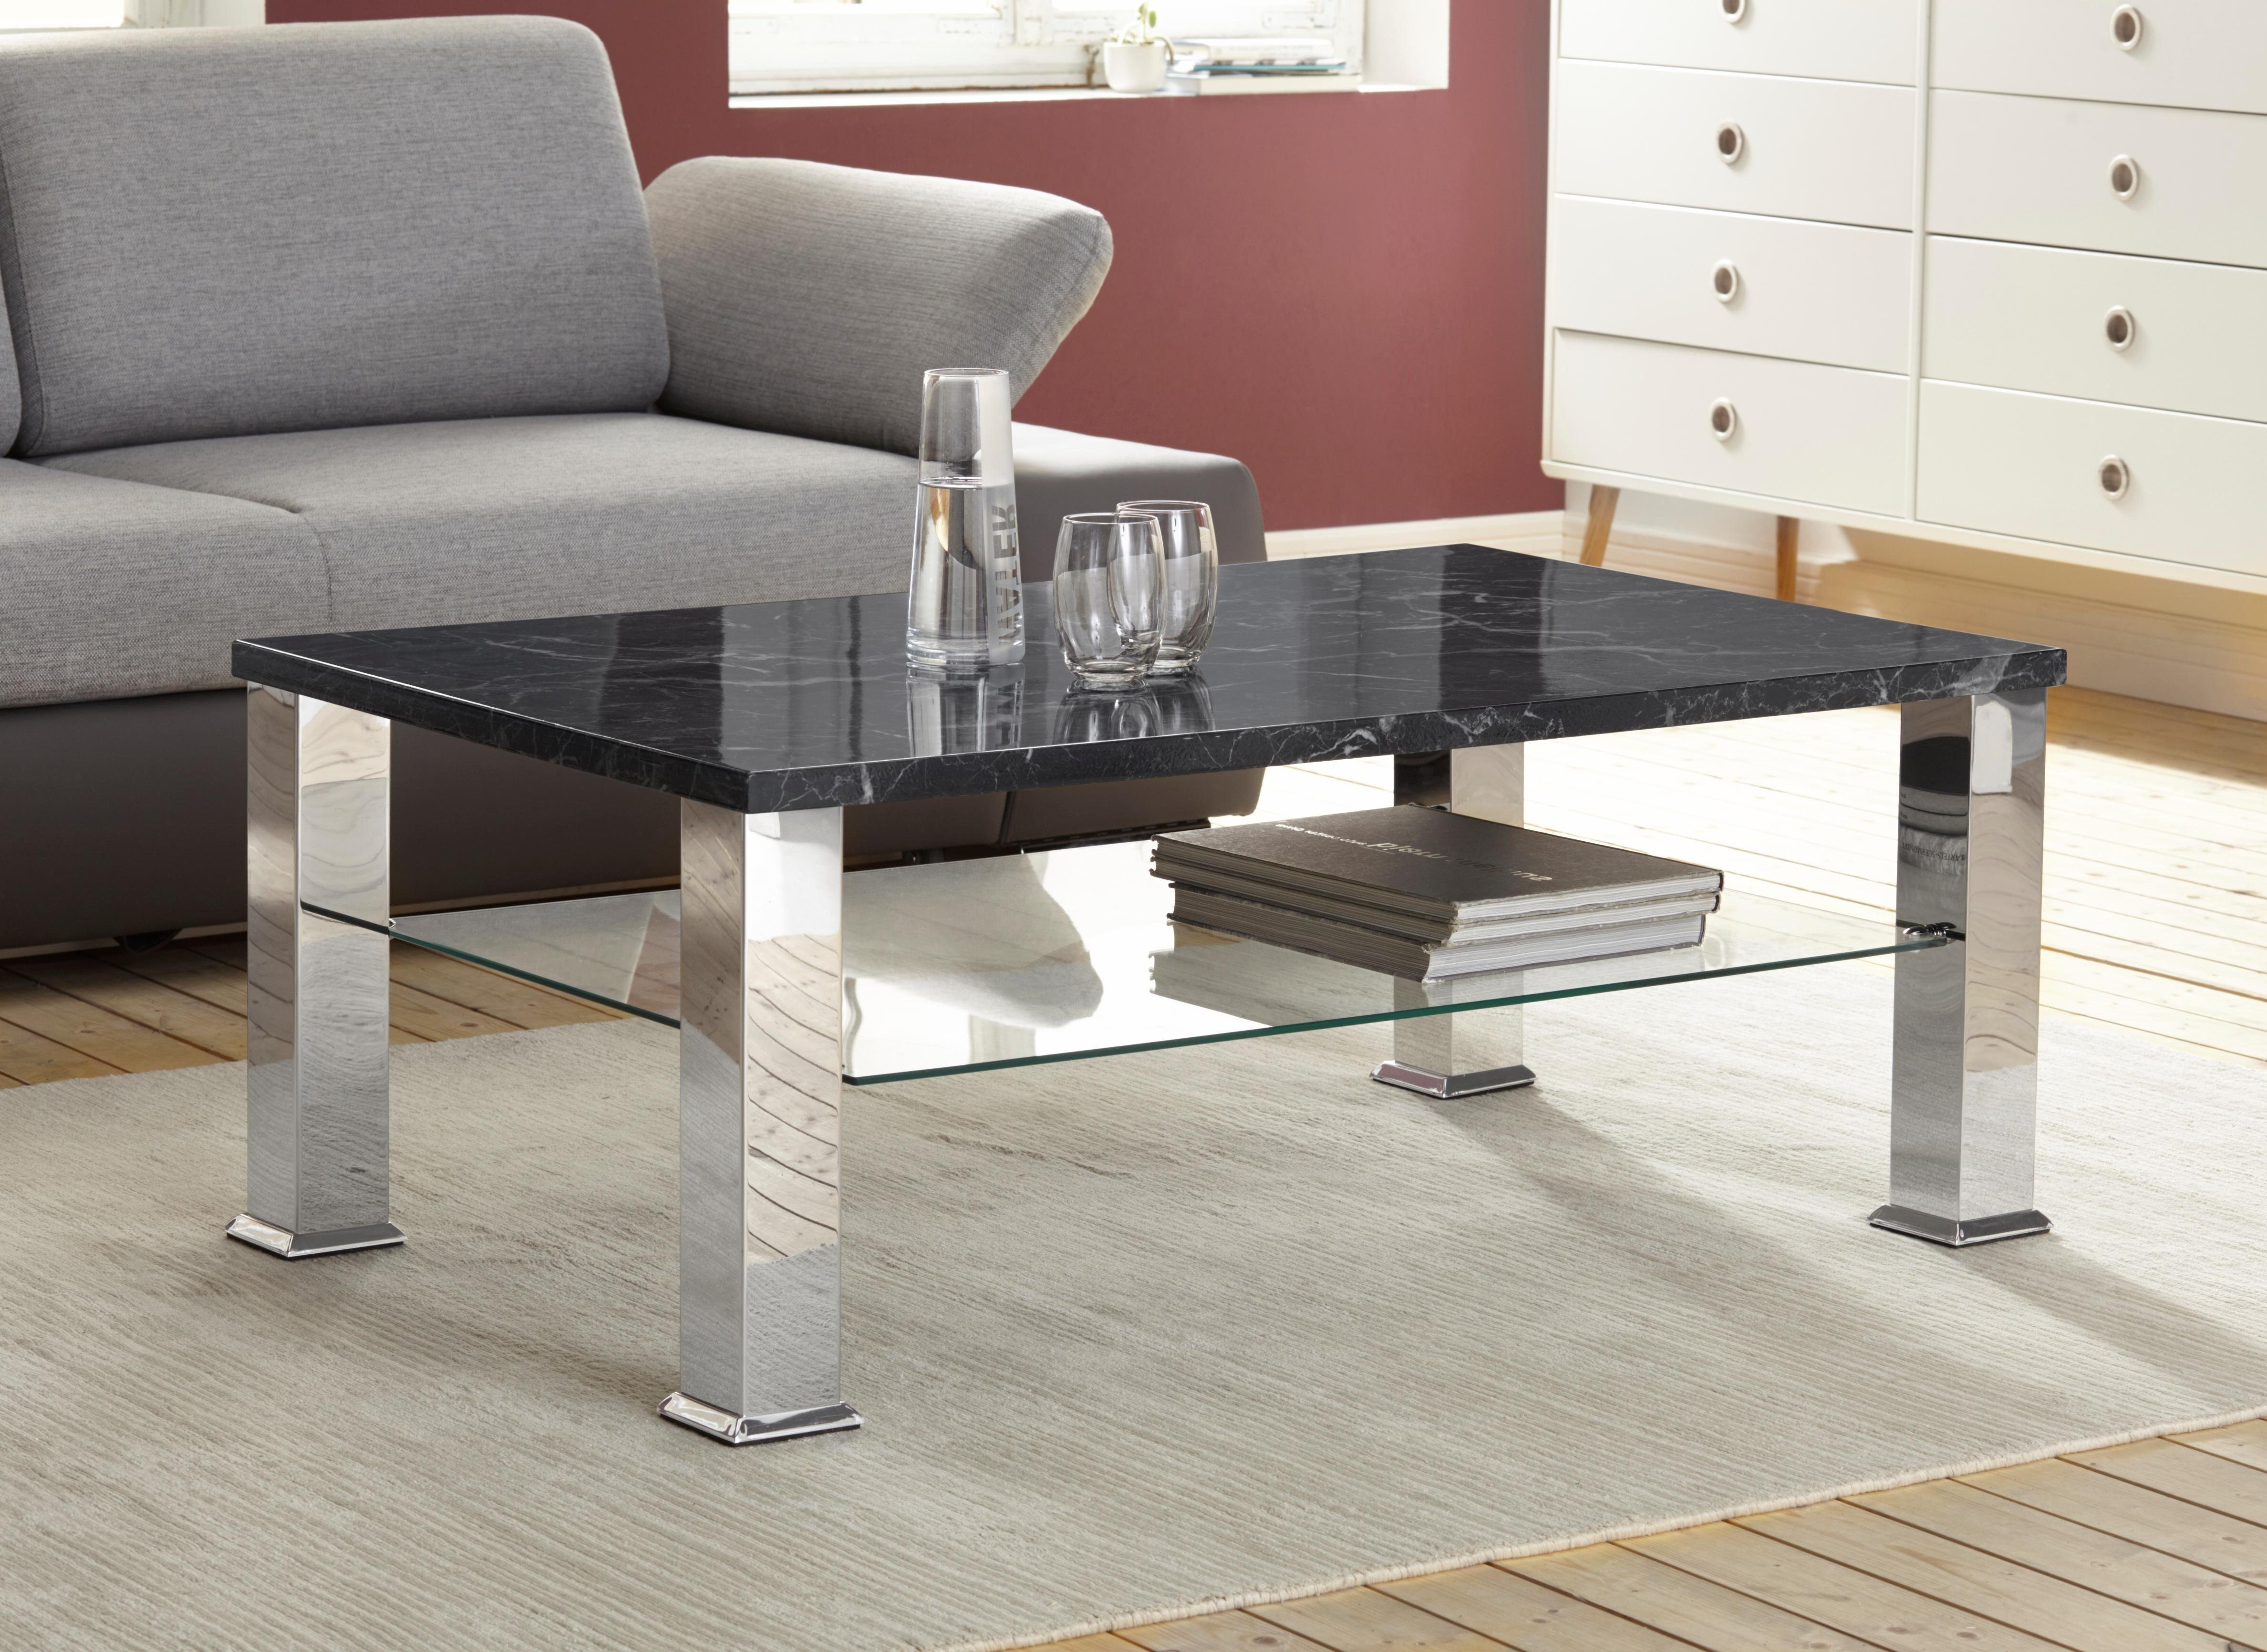 otto versand mbel couchtische free couchtisch leona. Black Bedroom Furniture Sets. Home Design Ideas